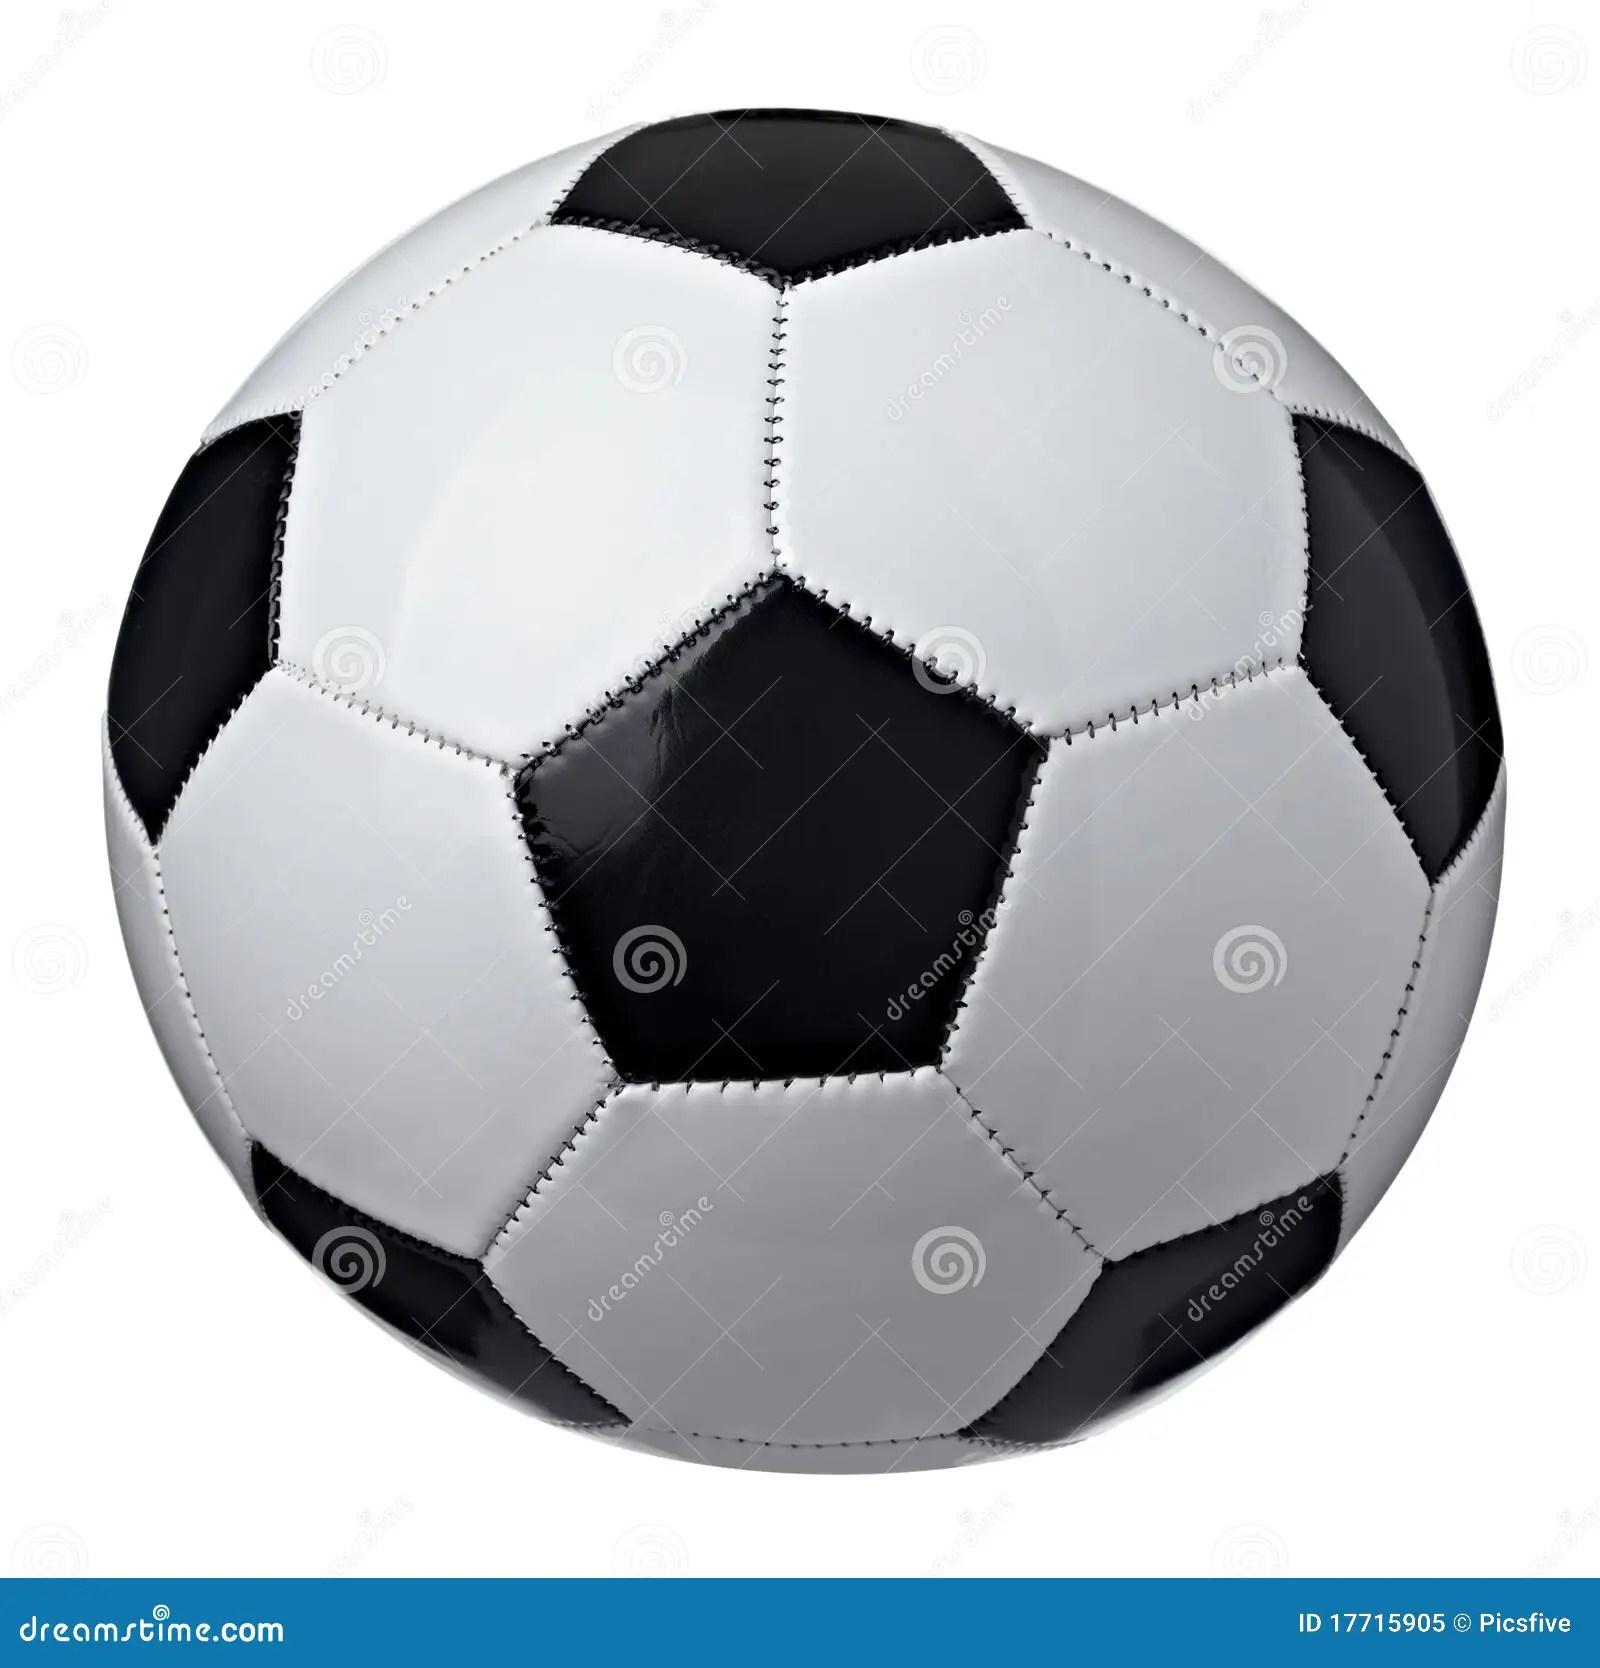 Soccer Ball Stock Image Image Of Leisure Pentagon Round